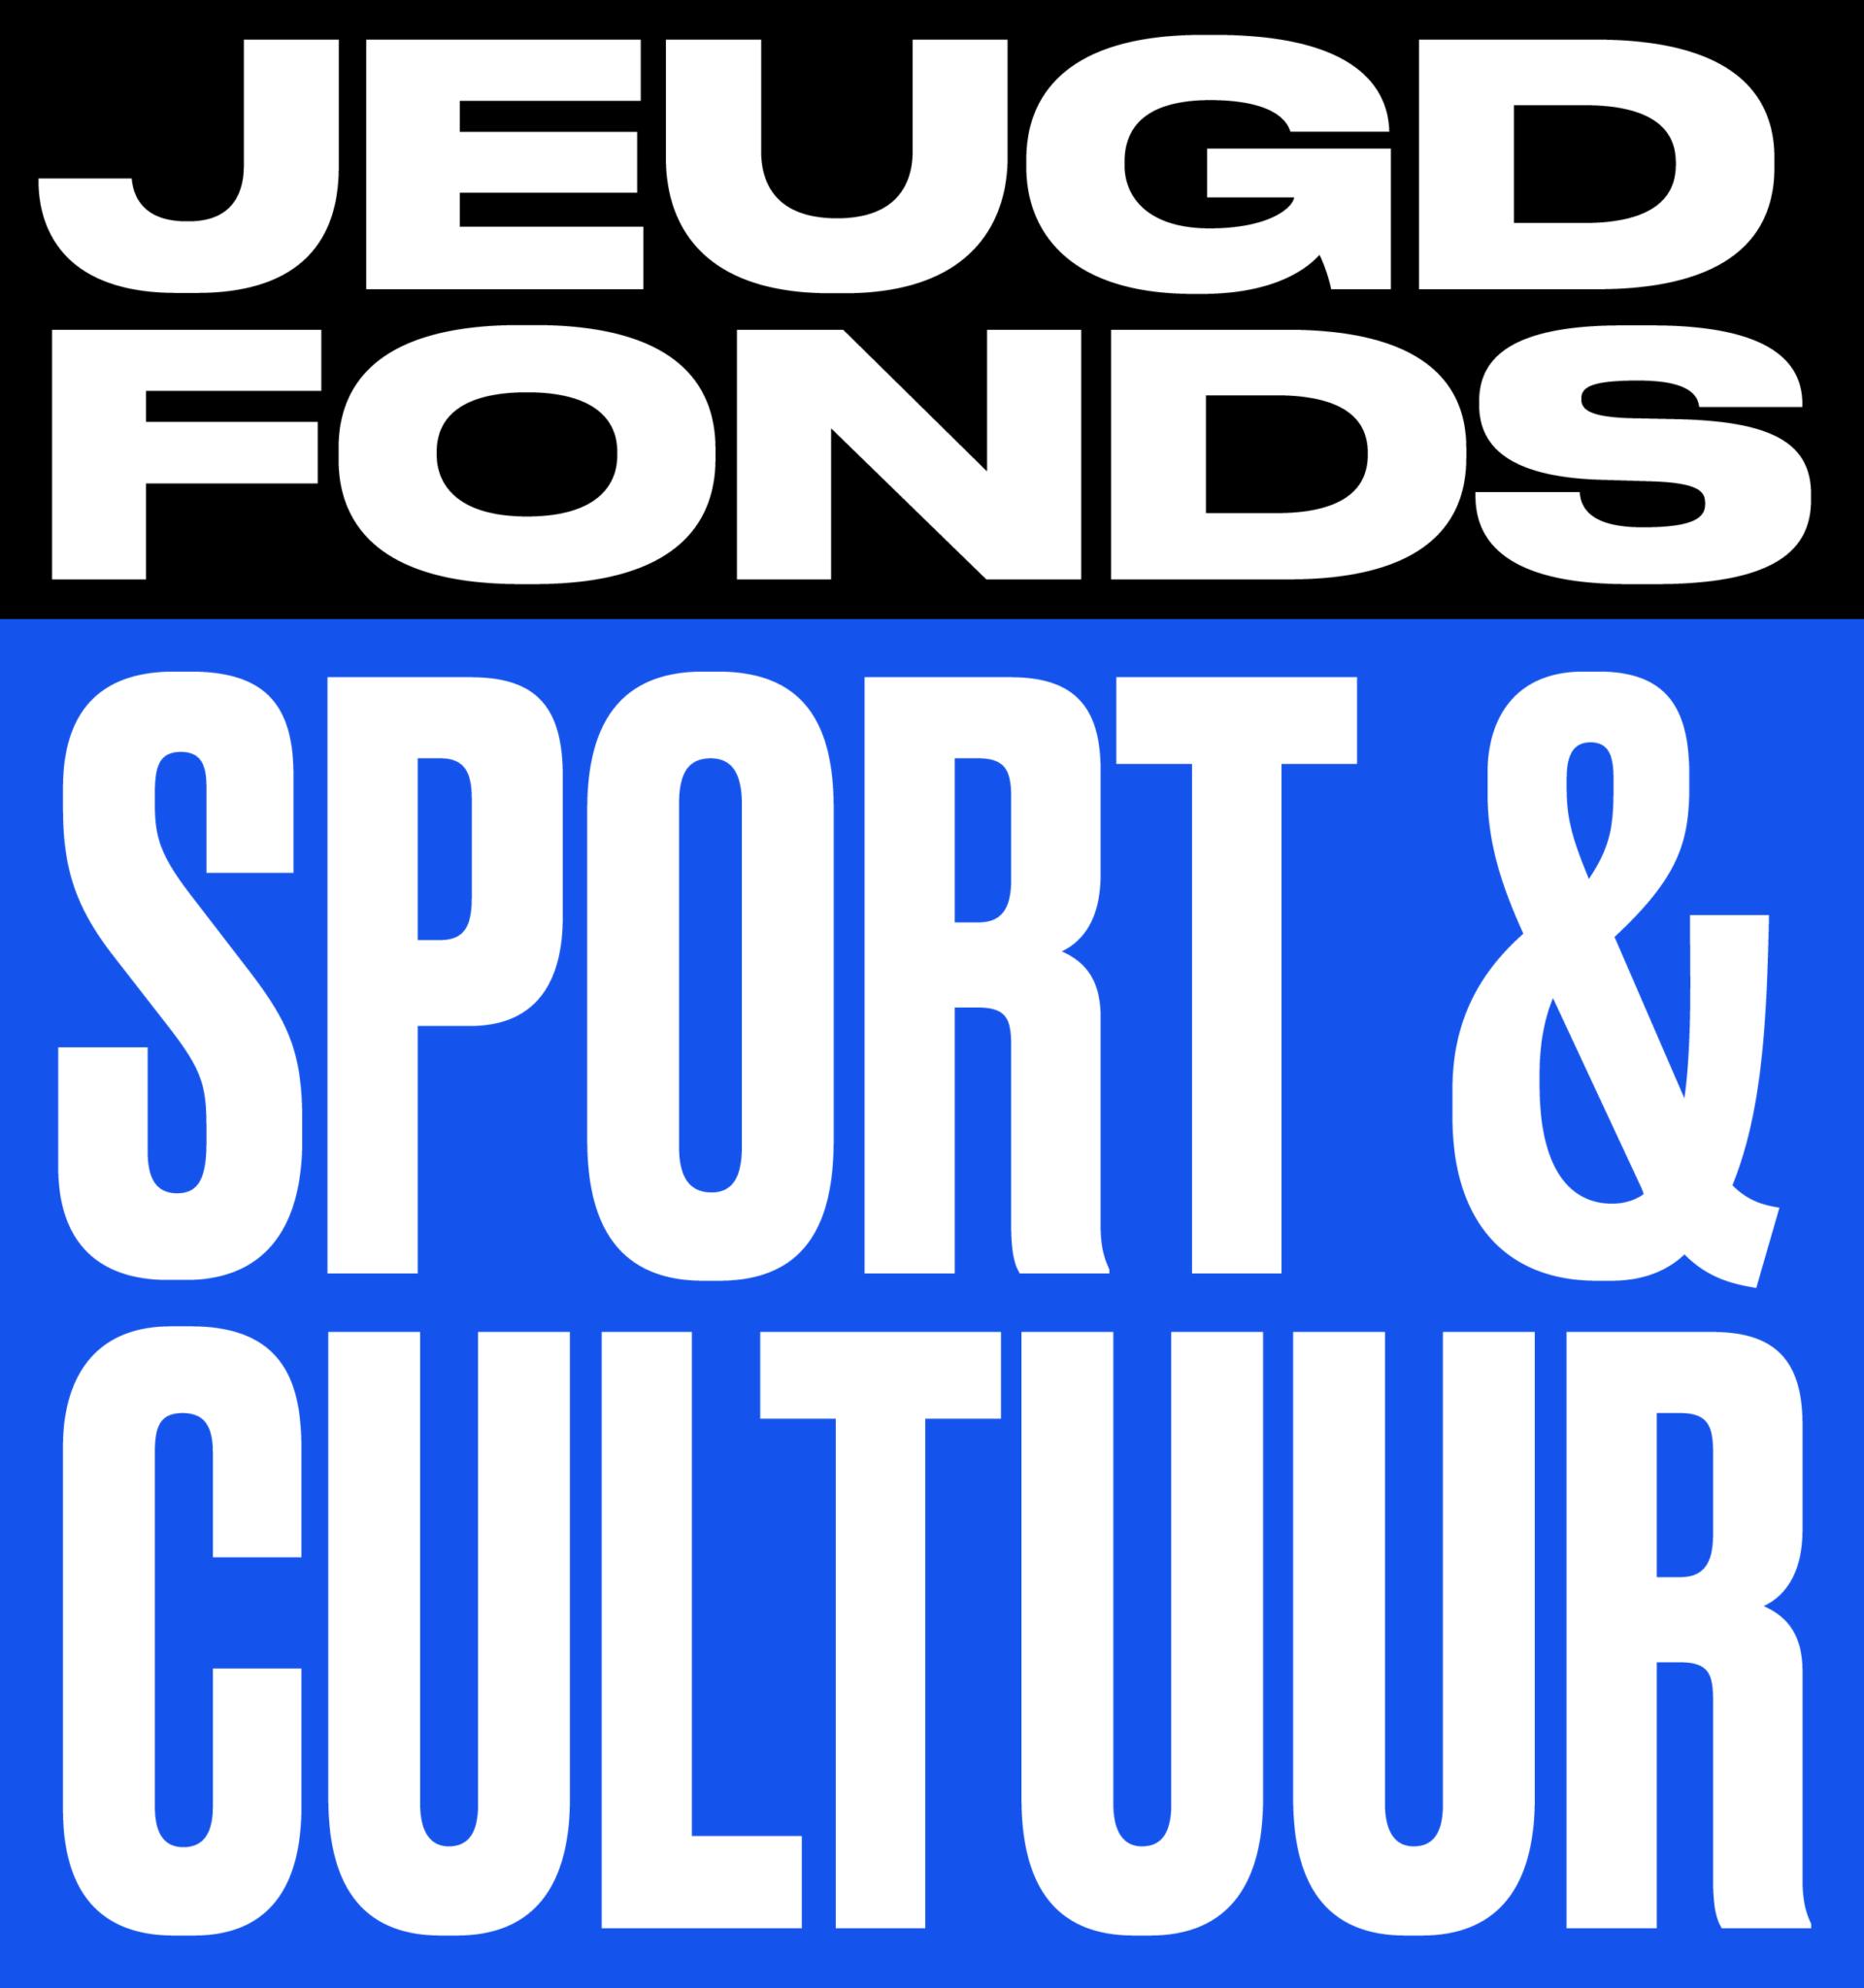 Het Jeugdsportfonds en Jeugdcultuurfonds verder als Jeugdfonds Sport & Cultuur